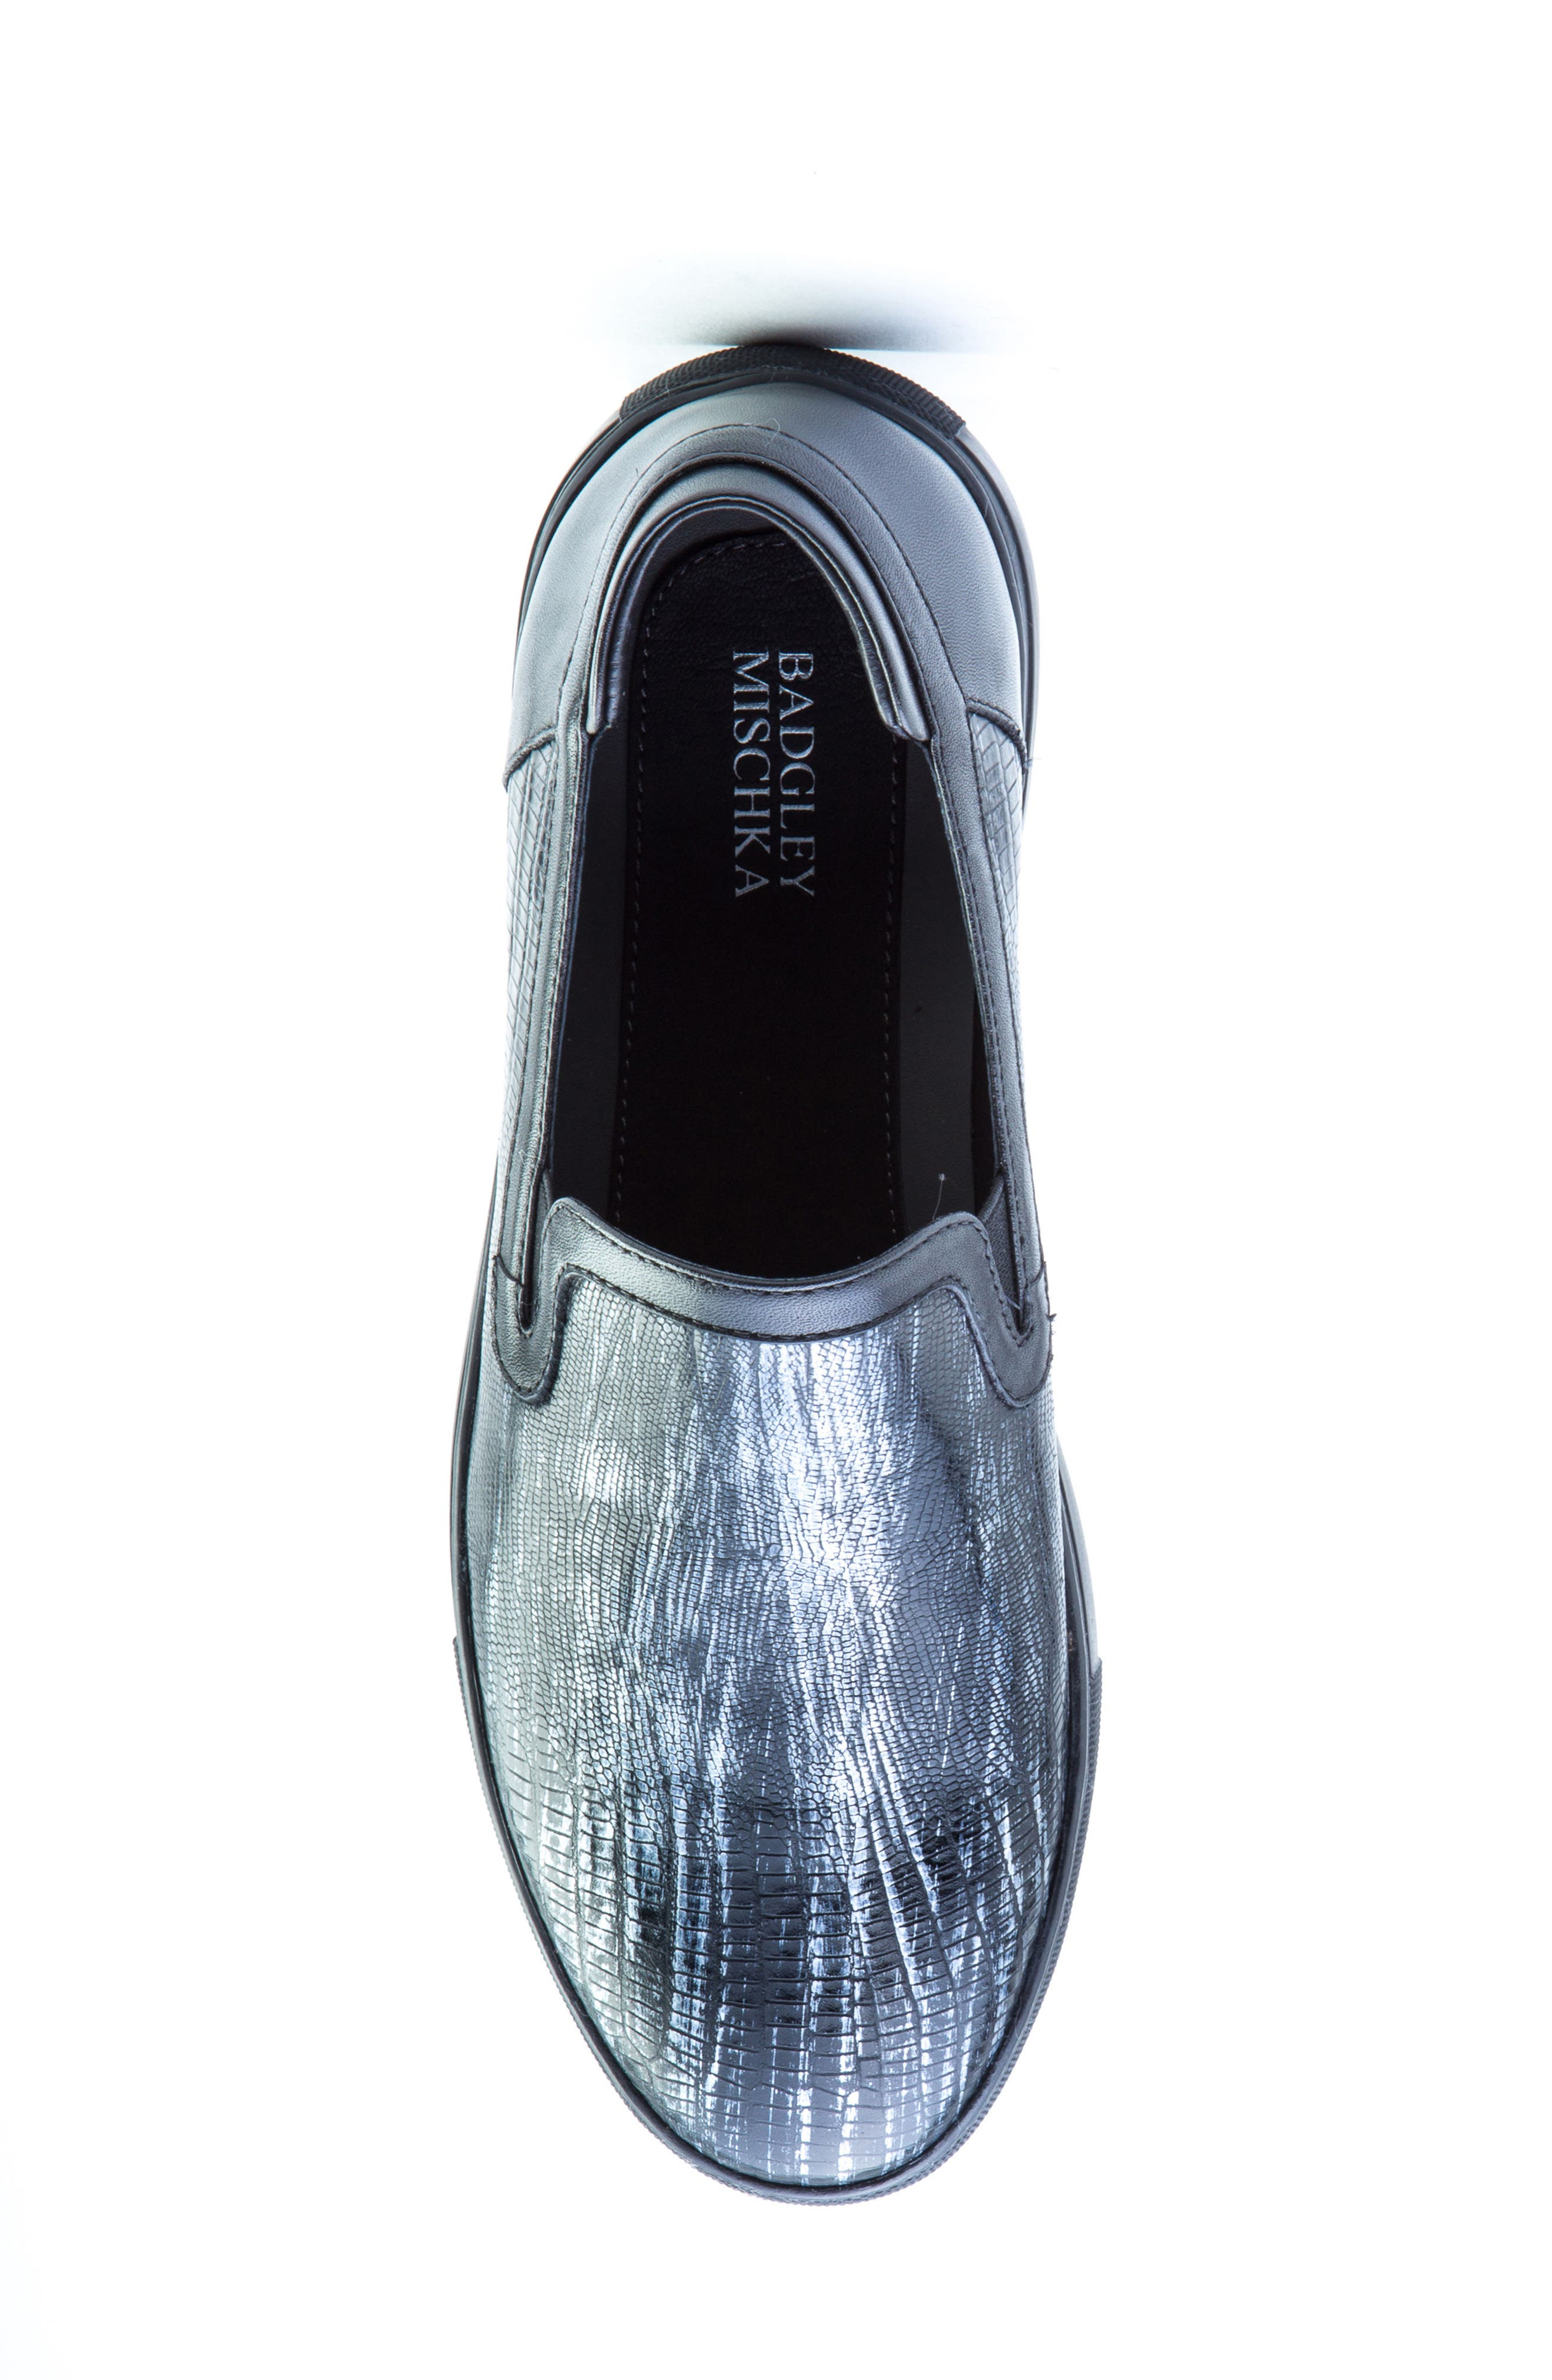 BADGLEY MISCHKA COLLECTION, Badgley Mischka Bogart Sneaker, Alternate thumbnail 5, color, BLACK LEATHER